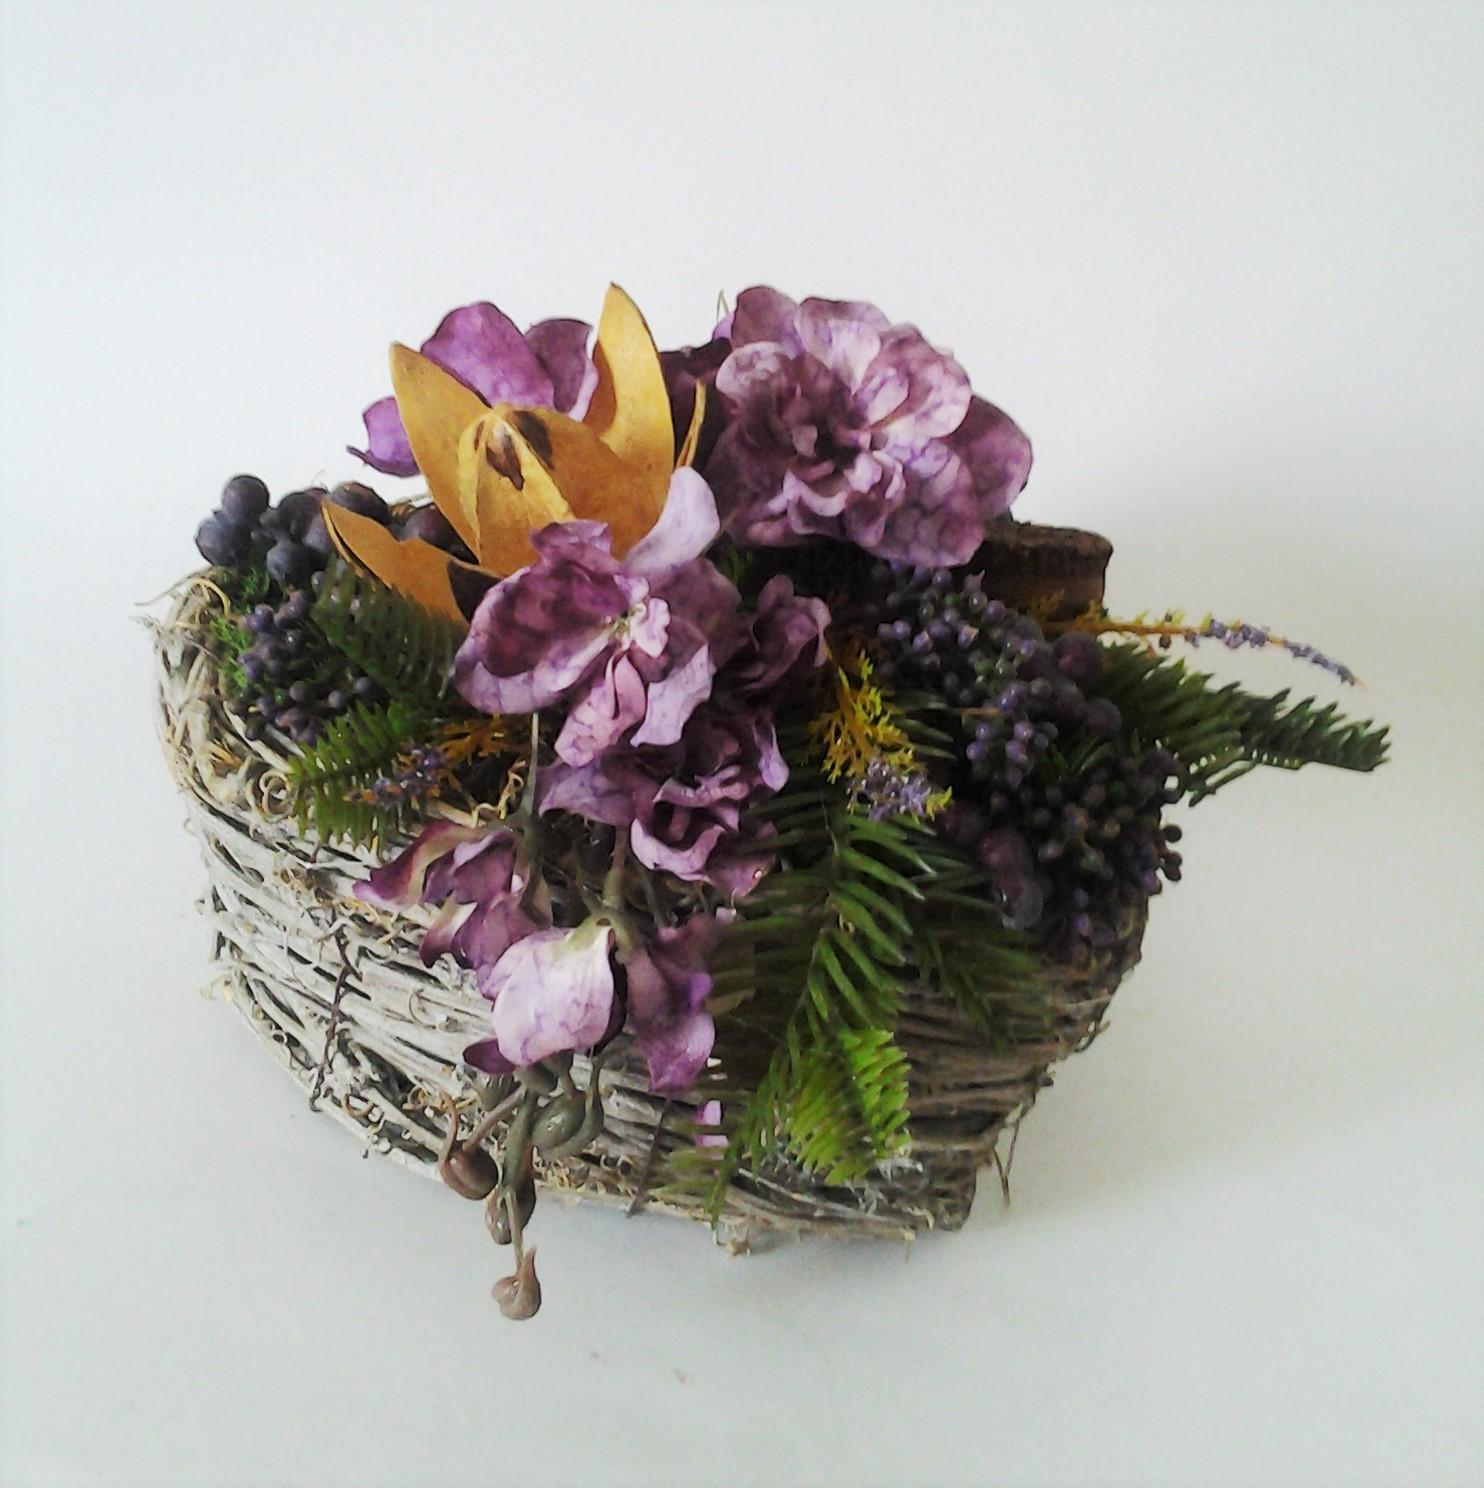 košík v tvare srdca s fialovými kvetmi 20 x 18 cm